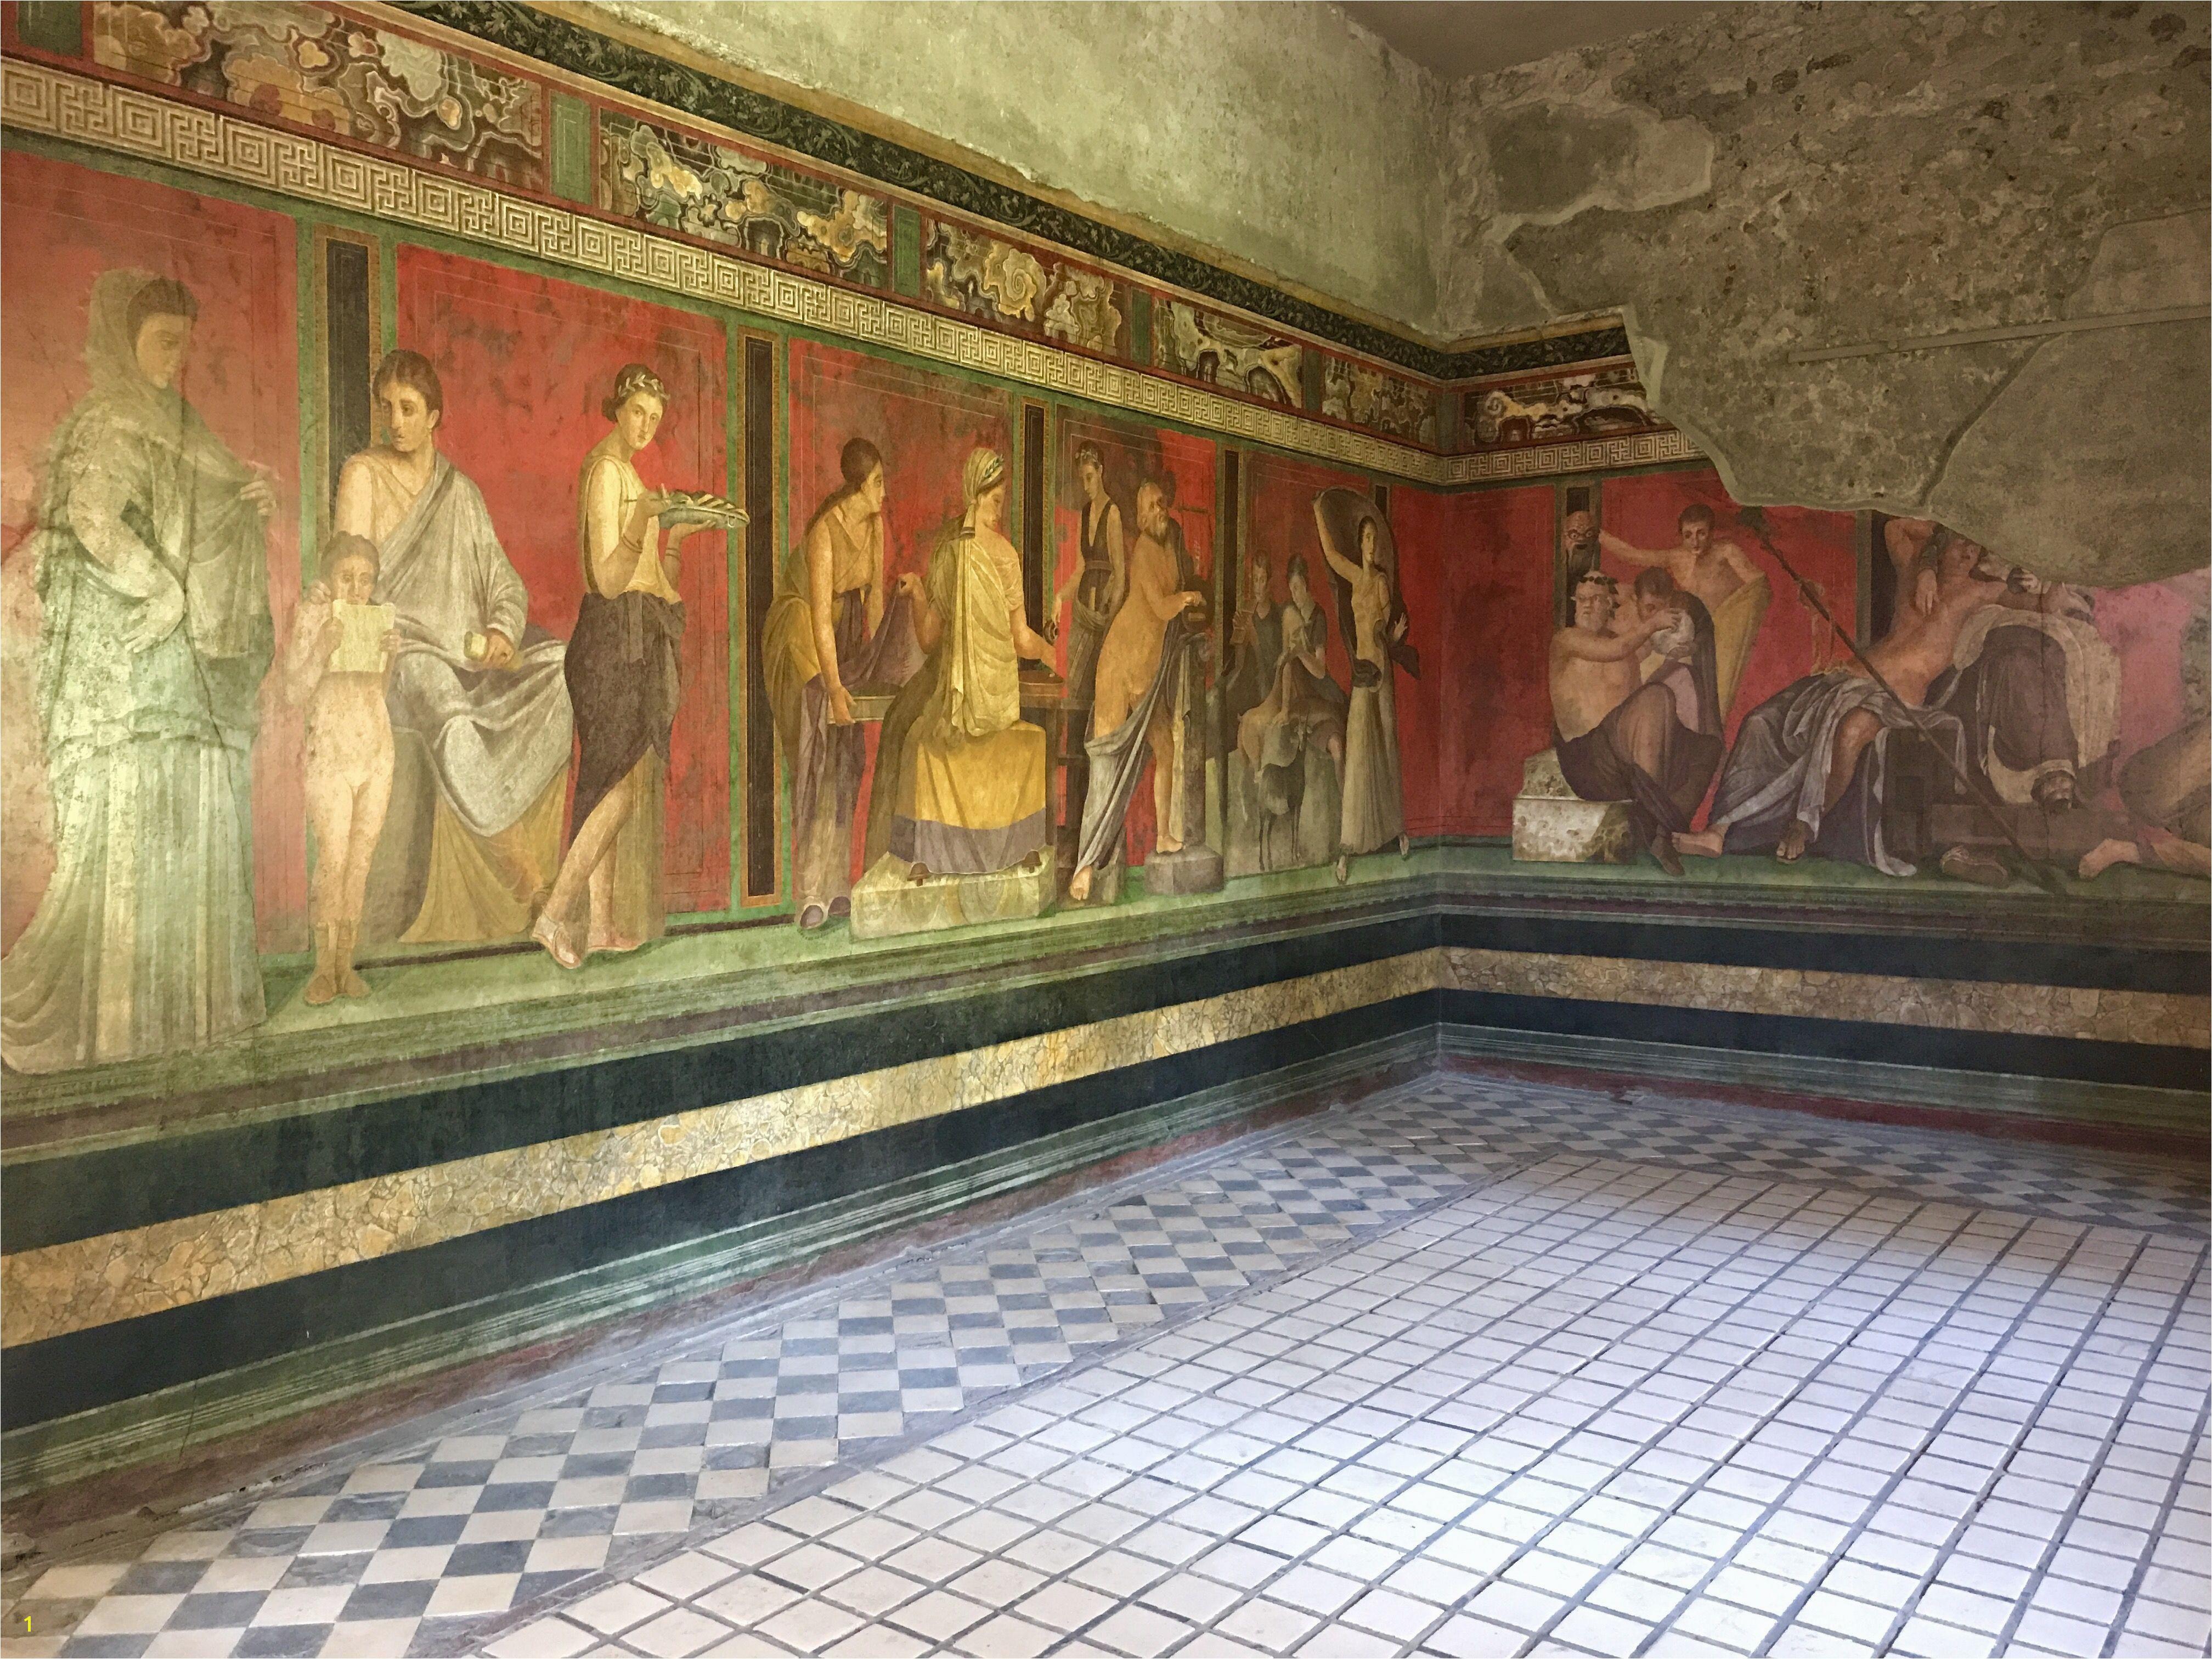 Ancient Roman Murals Pompeii Villa Dei Misteri the Series Of Frescoes Depicted Here are